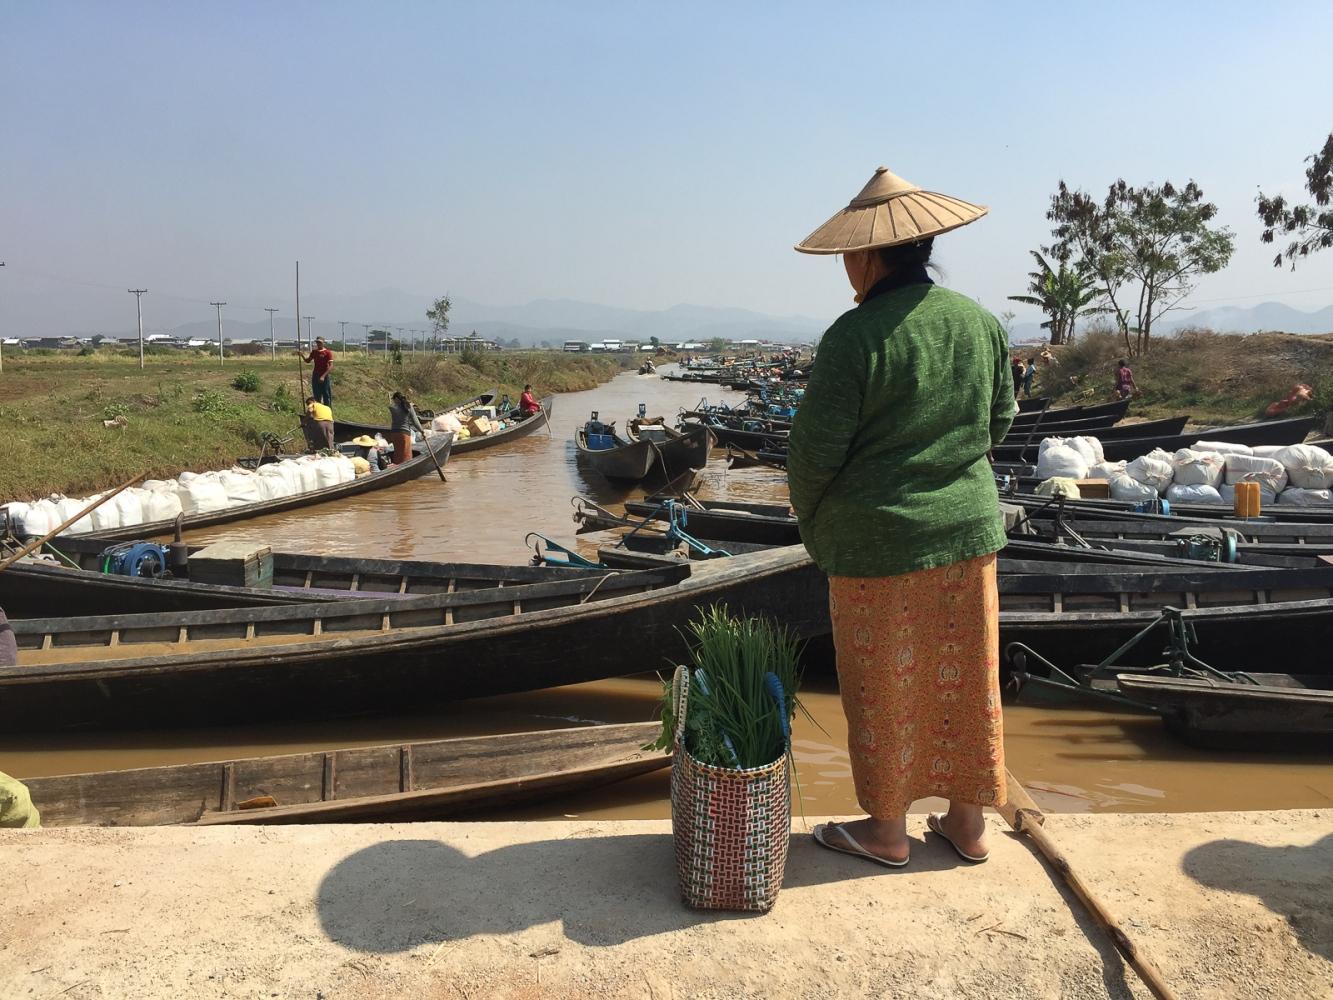 Art and Documentary Photography - Loading 20150215_Burma_2015_0224.jpg